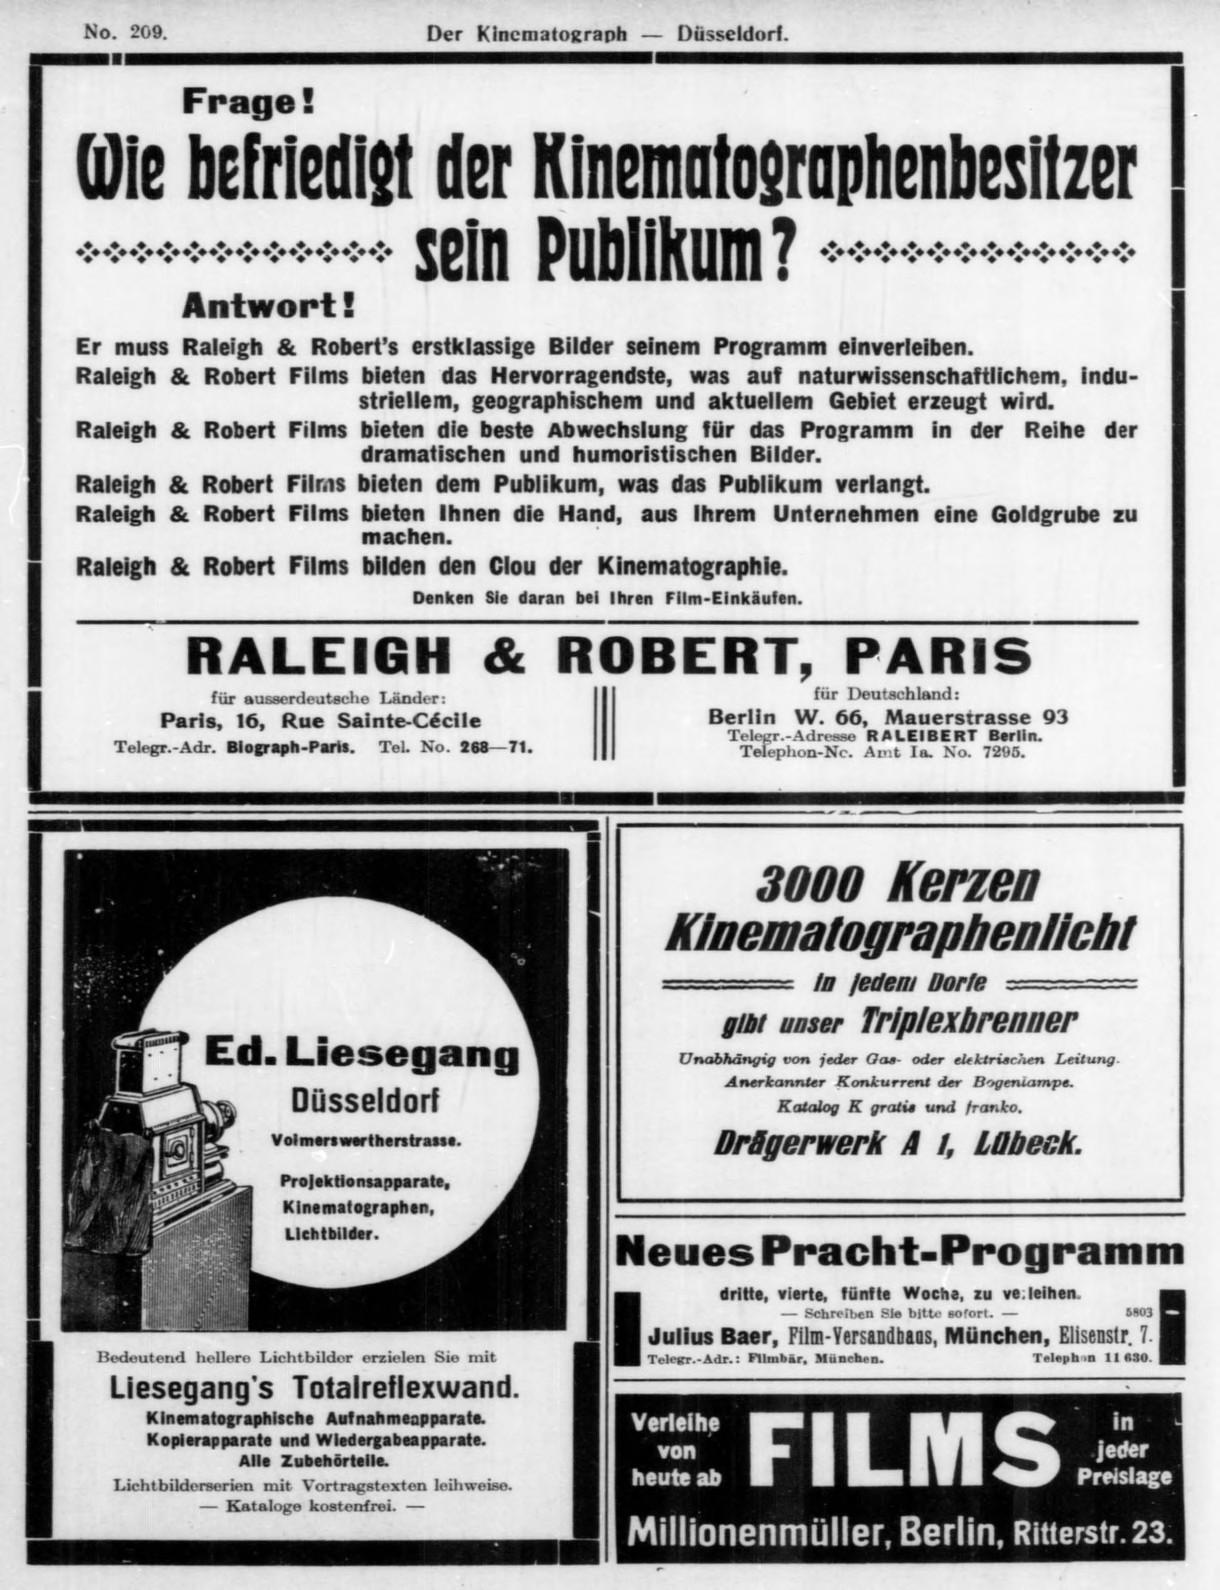 Kinematograph04-1910-12_jp2.zip&file=kinematograph04-1910-12_jp2%2fkinematograph04-1910-12_0089